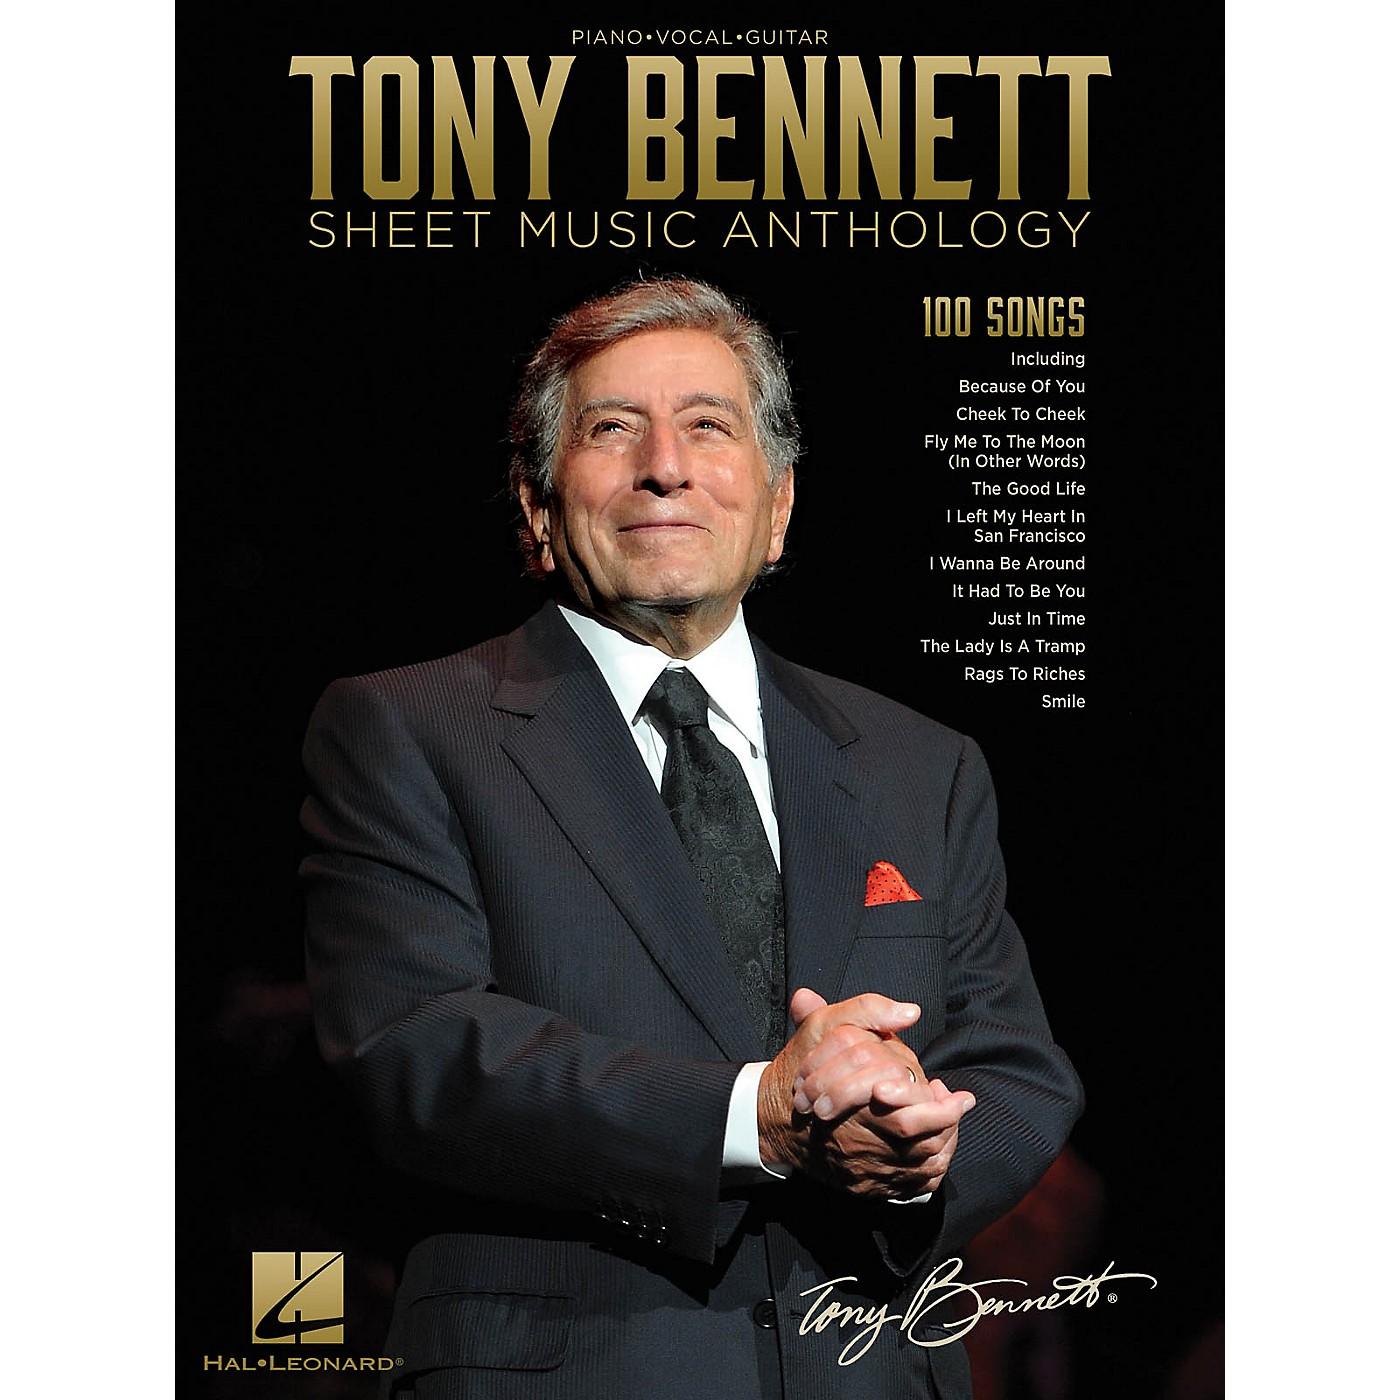 Hal Leonard Tony Bennett Sheet Music Anthology Piano/Vocal/Guitar Songbook thumbnail